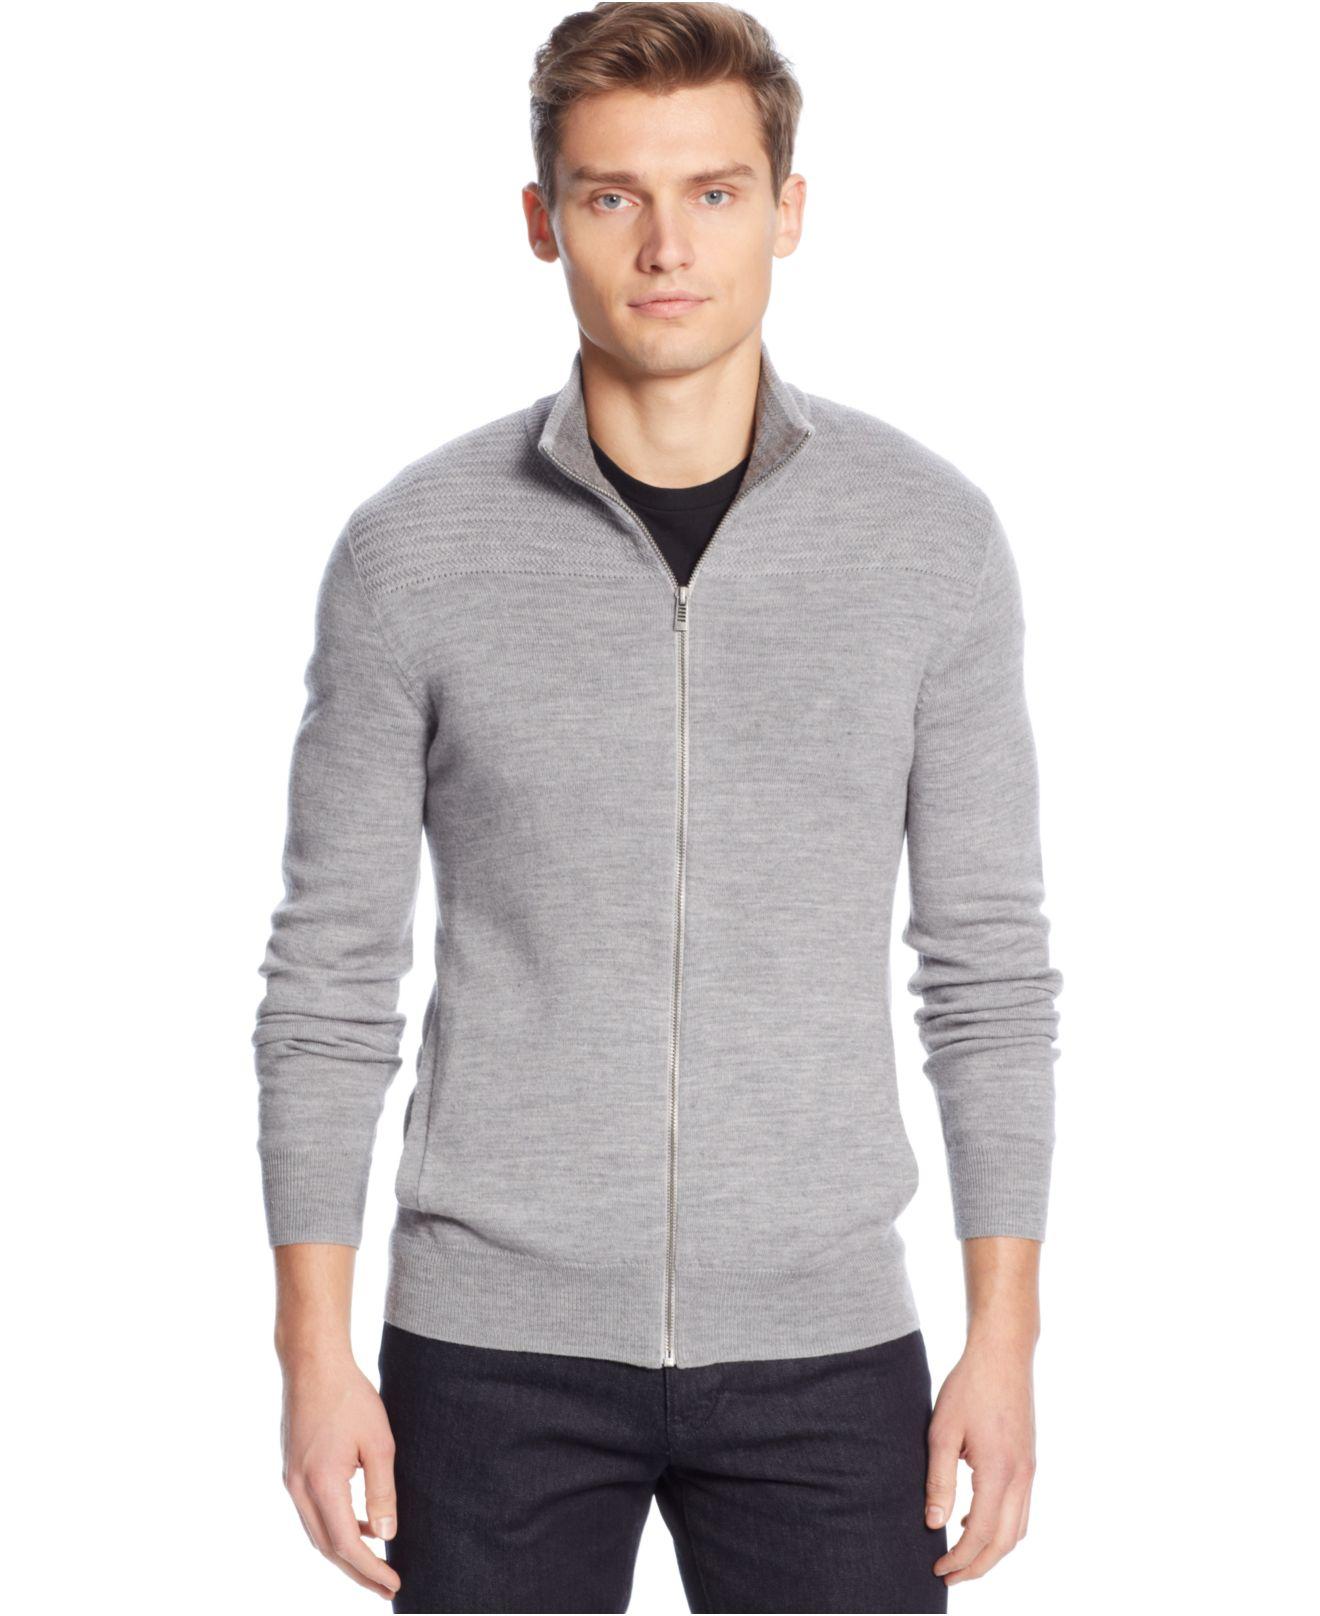 Calvin klein Merino Wool Wave Ribbed Full-Zip Sweater in Gray for ...